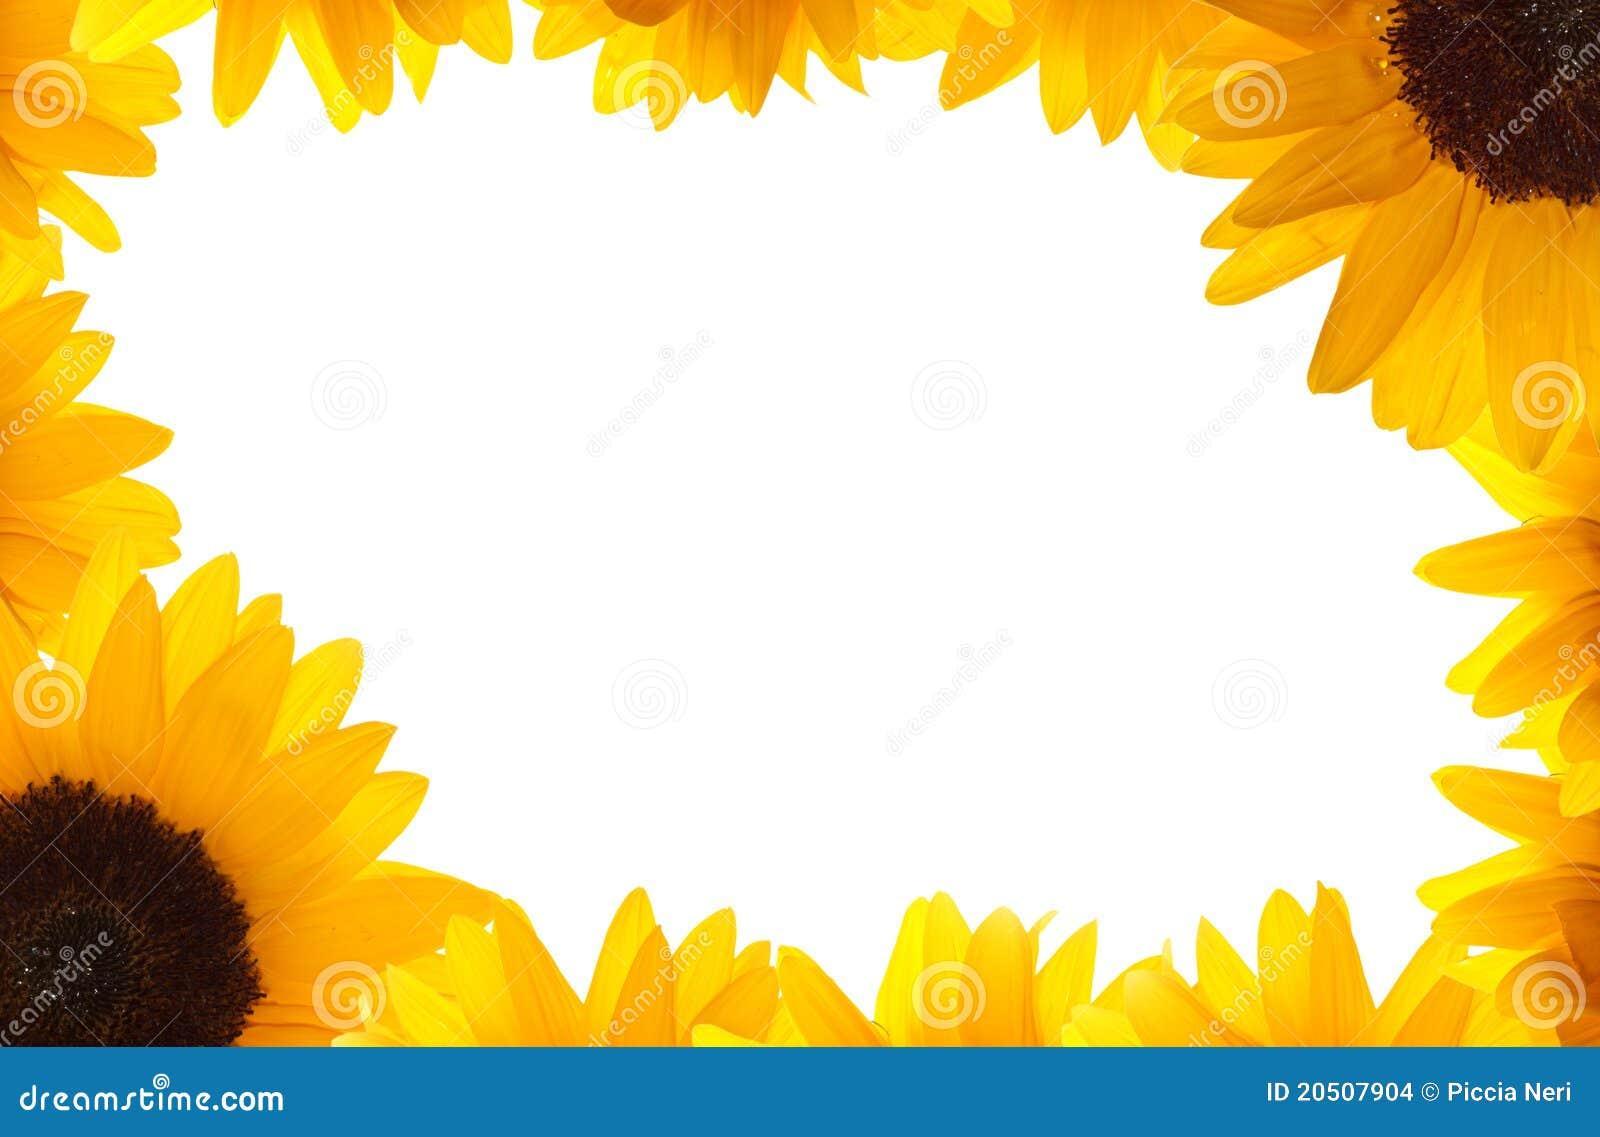 Sunflower frame stock photo. Image of summertime, nature - 20507904